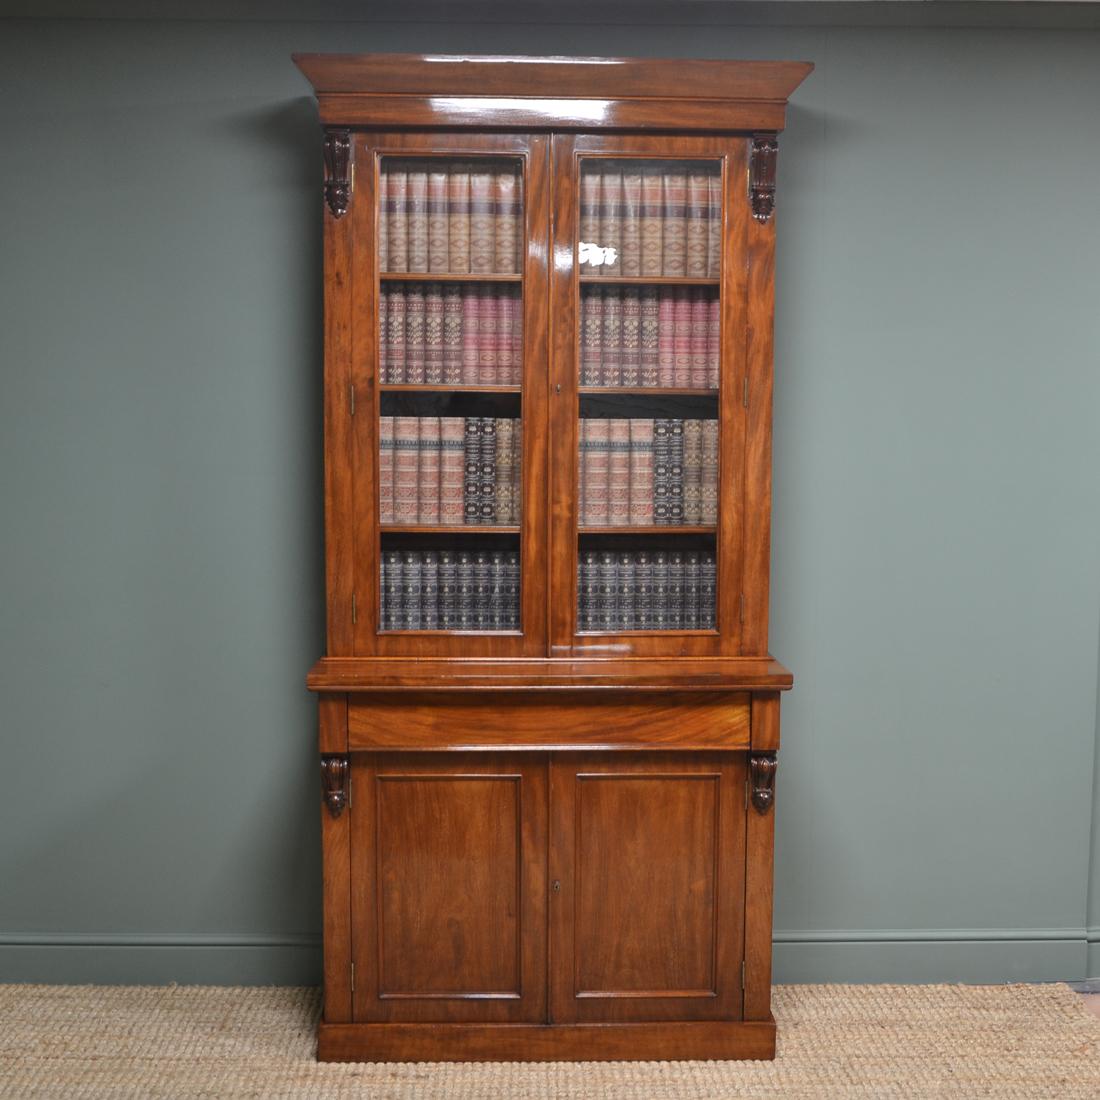 Striking Victorian Mahogany Antique Glazed Bookcase On Cupboard 07547 La195198 Loveantiques Com